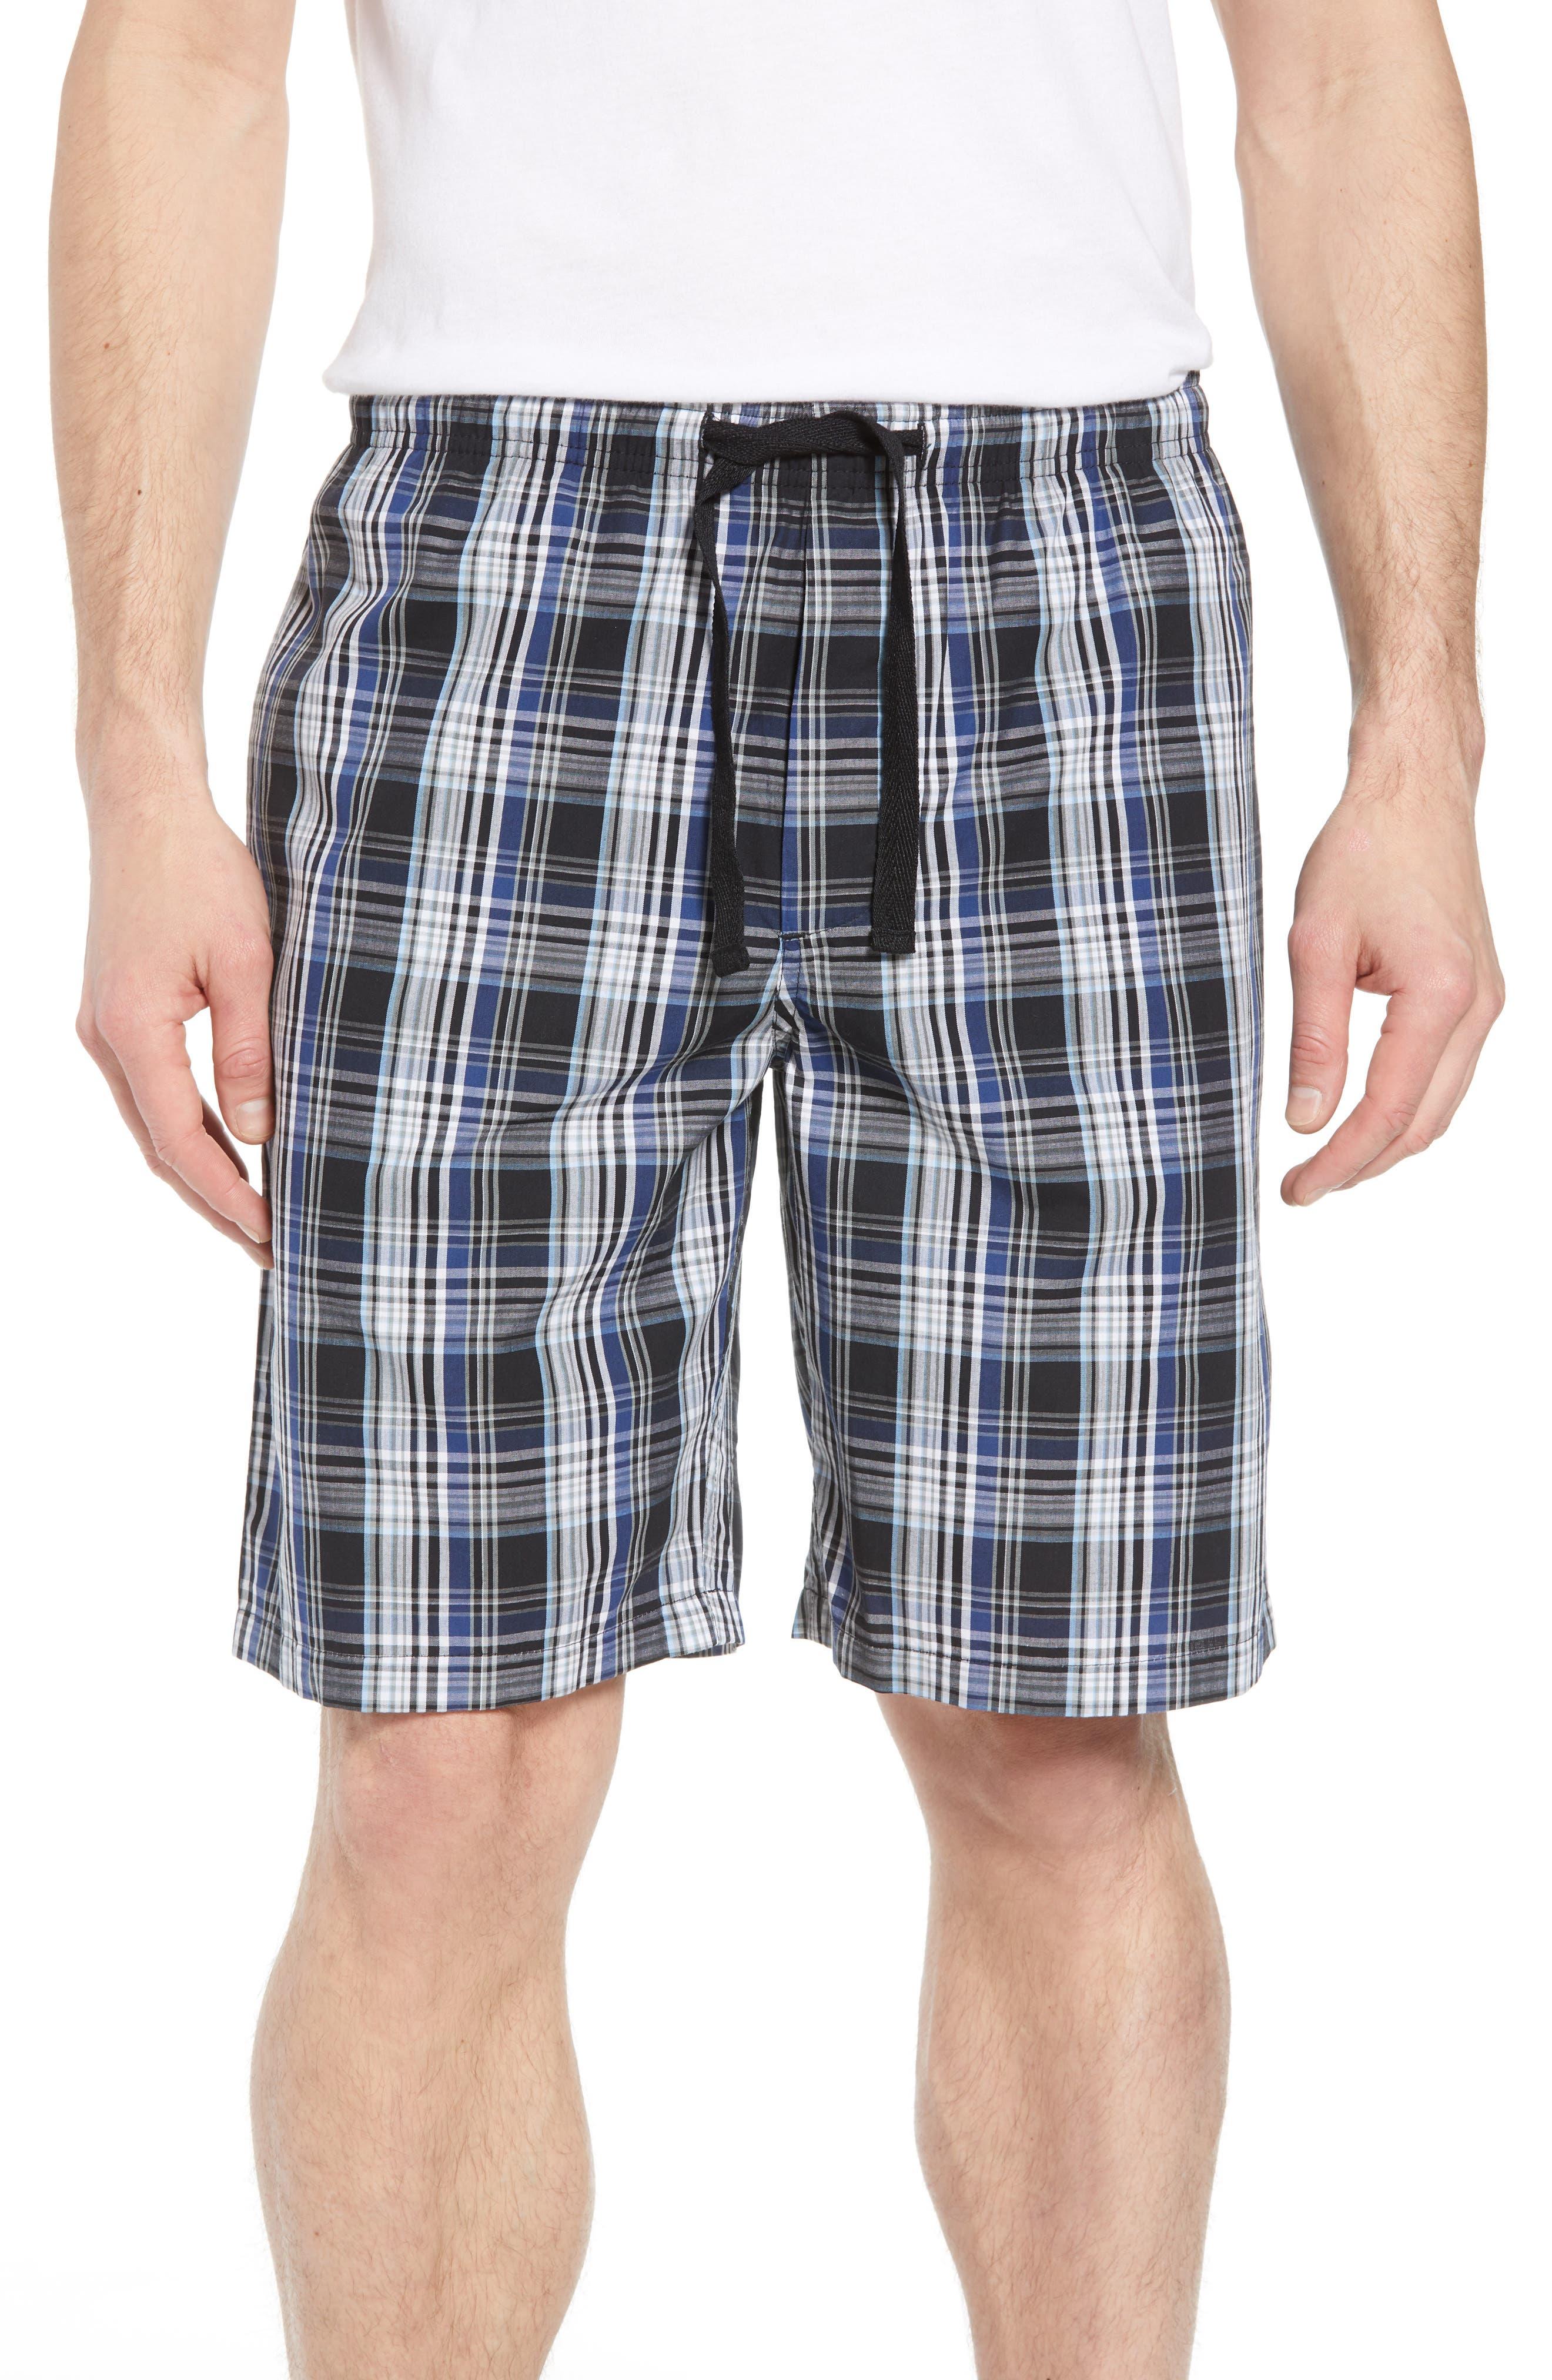 NORDSTROM MEN'S SHOP, Poplin Lounge Shorts, Main thumbnail 1, color, BLACK TWILIGHT BLUE PLAID